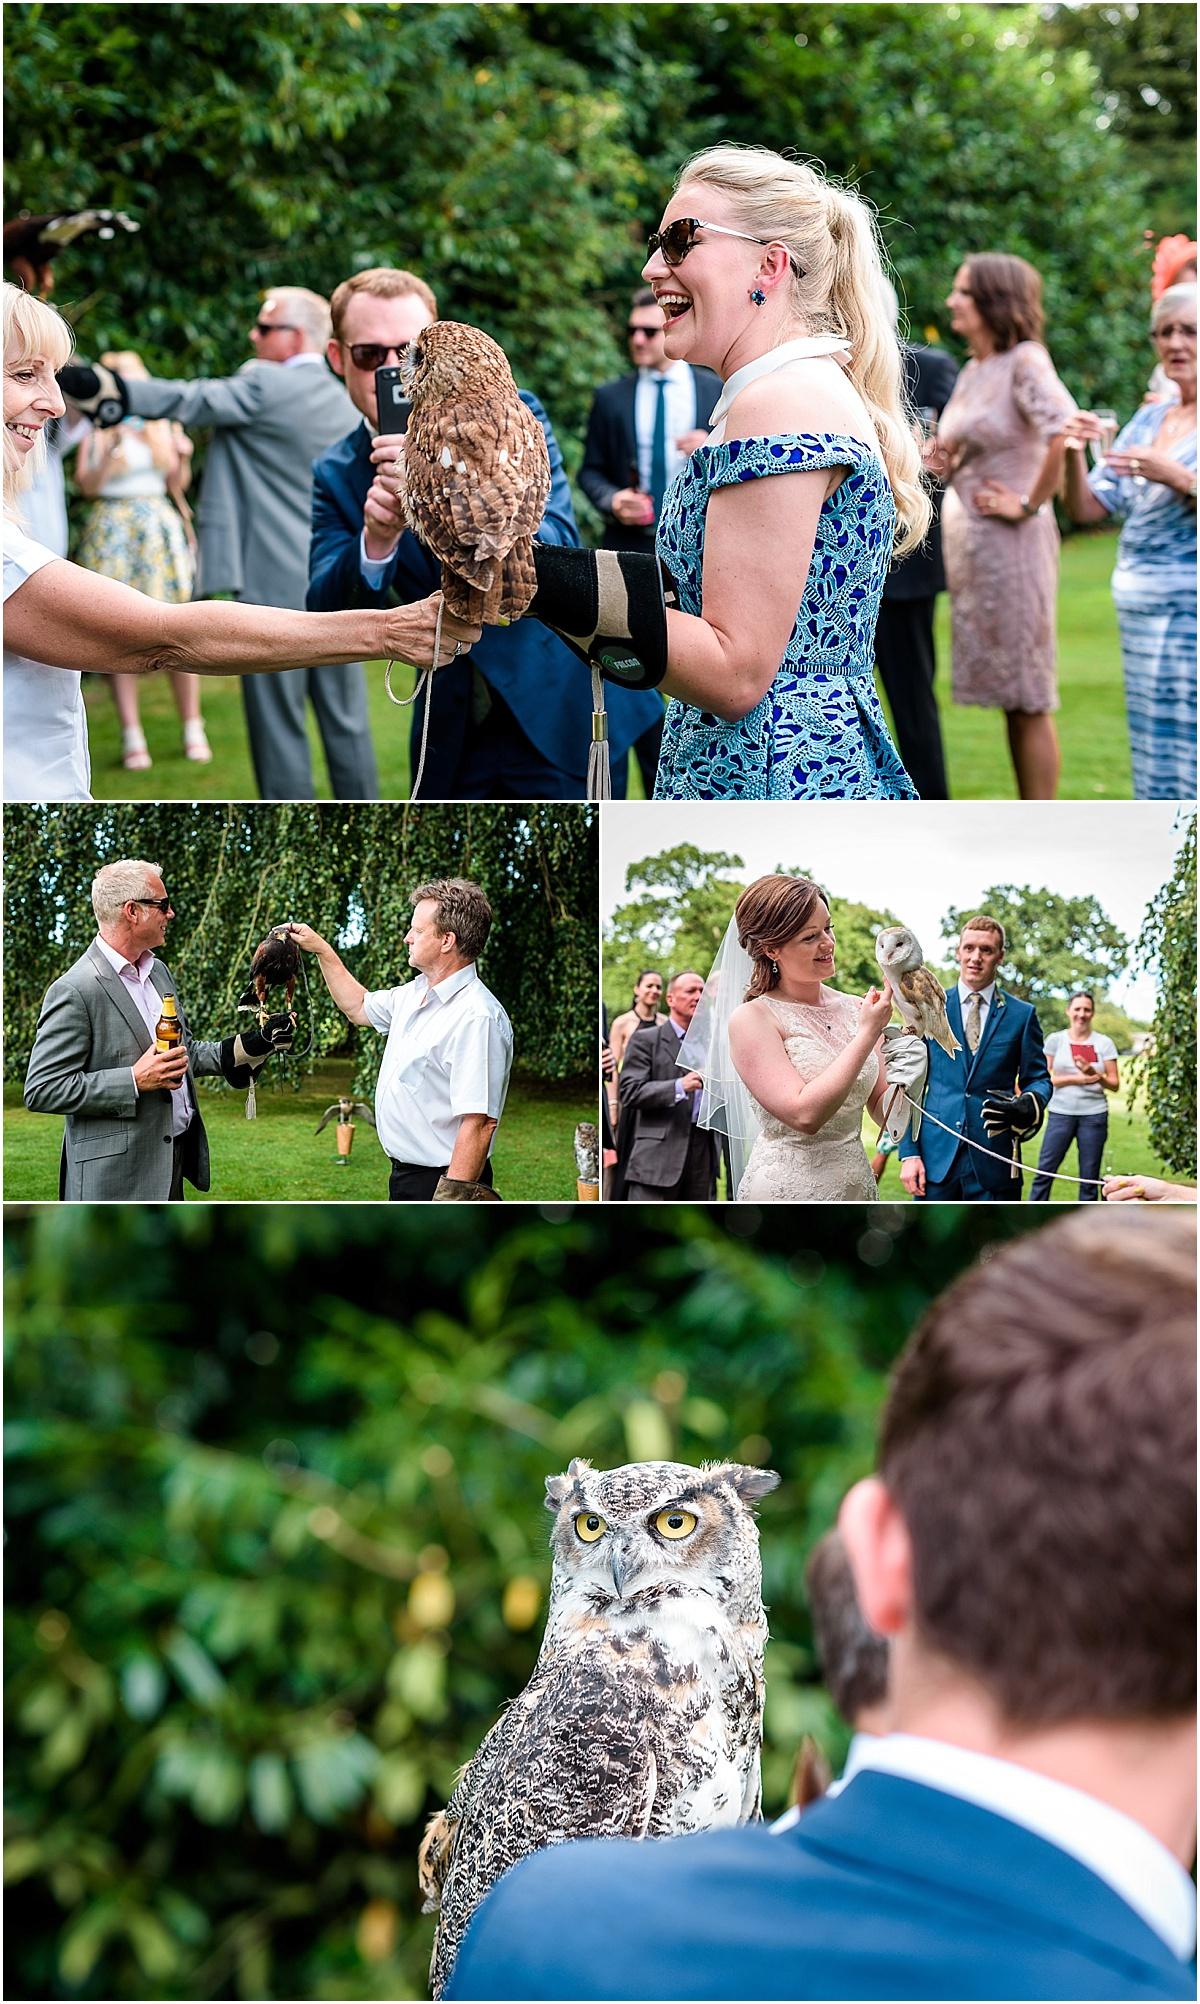 birds of pray at wedding